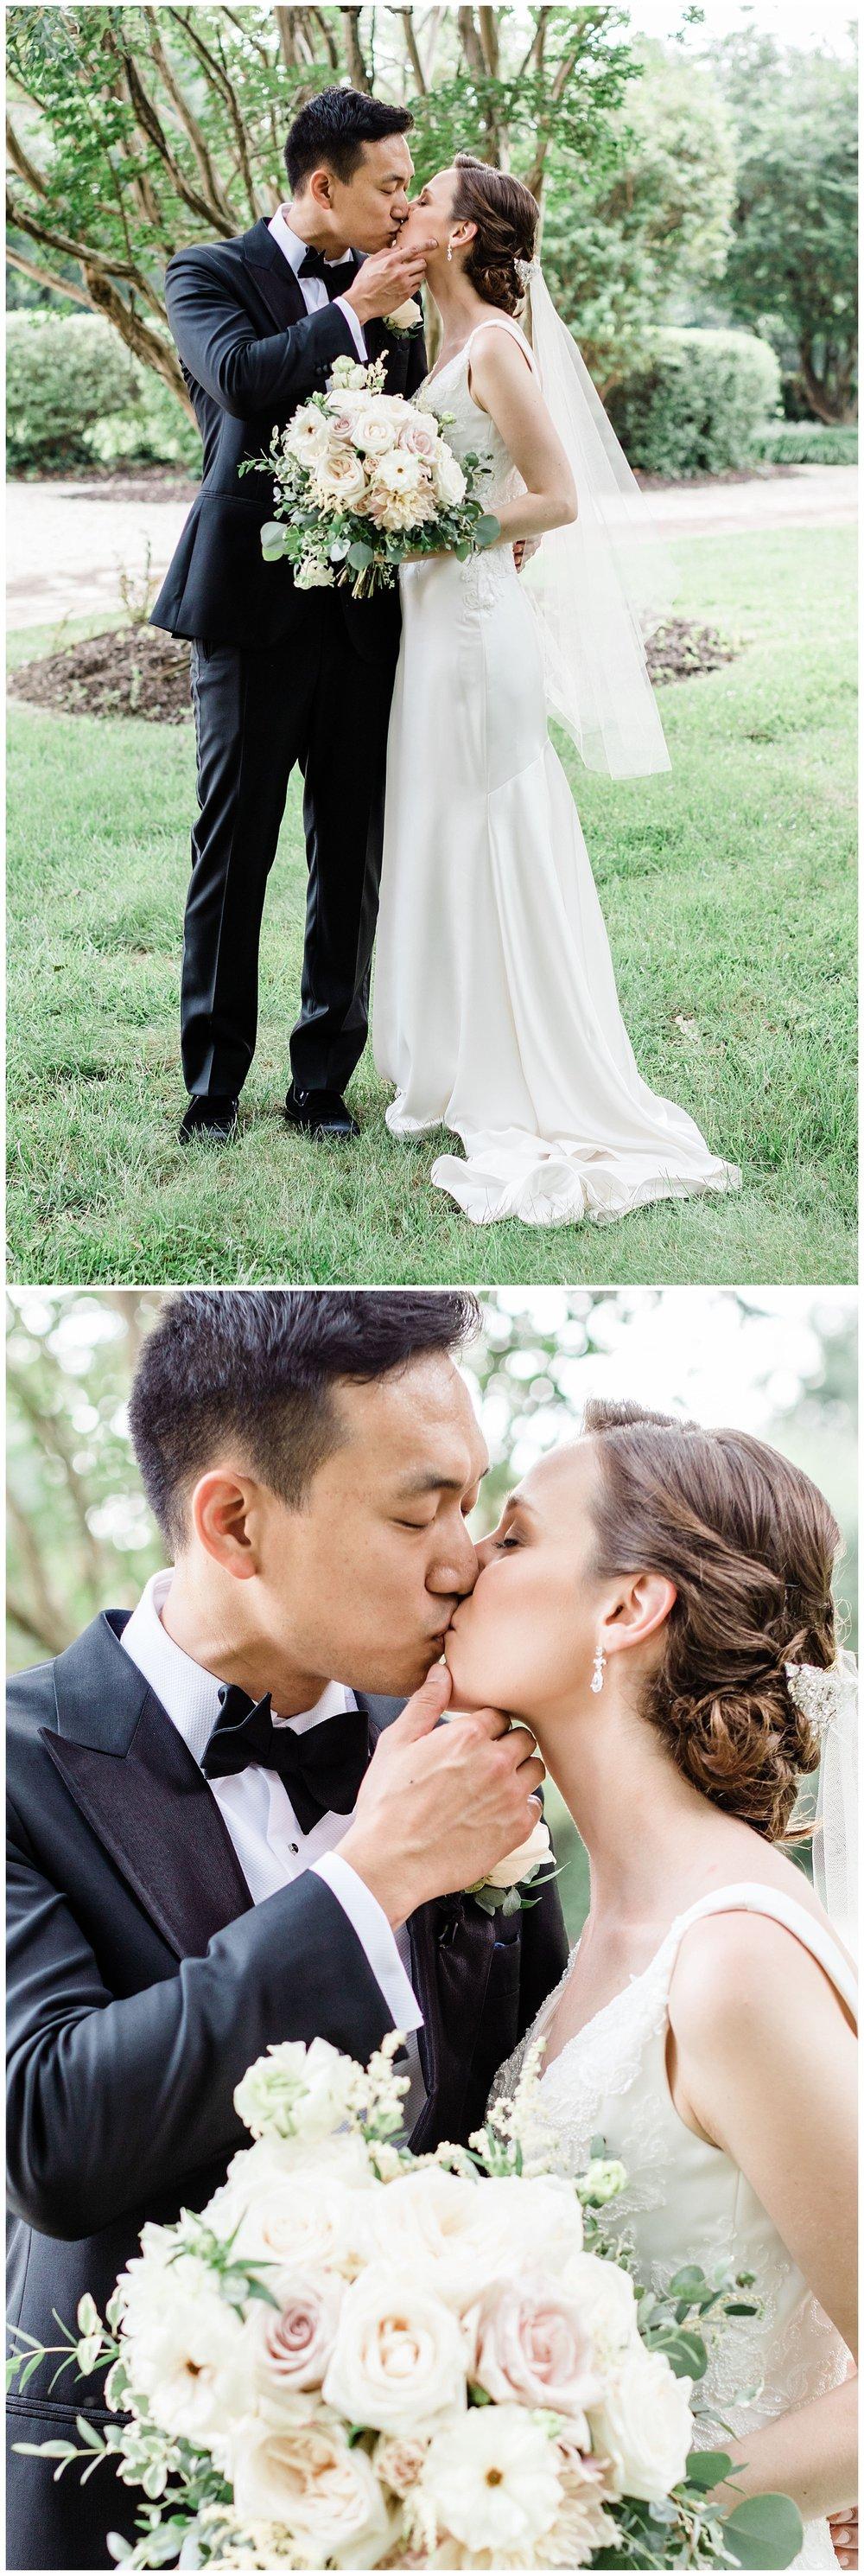 Elizabeth M Photography Charlottesville Wedding Photography_0468.jpg